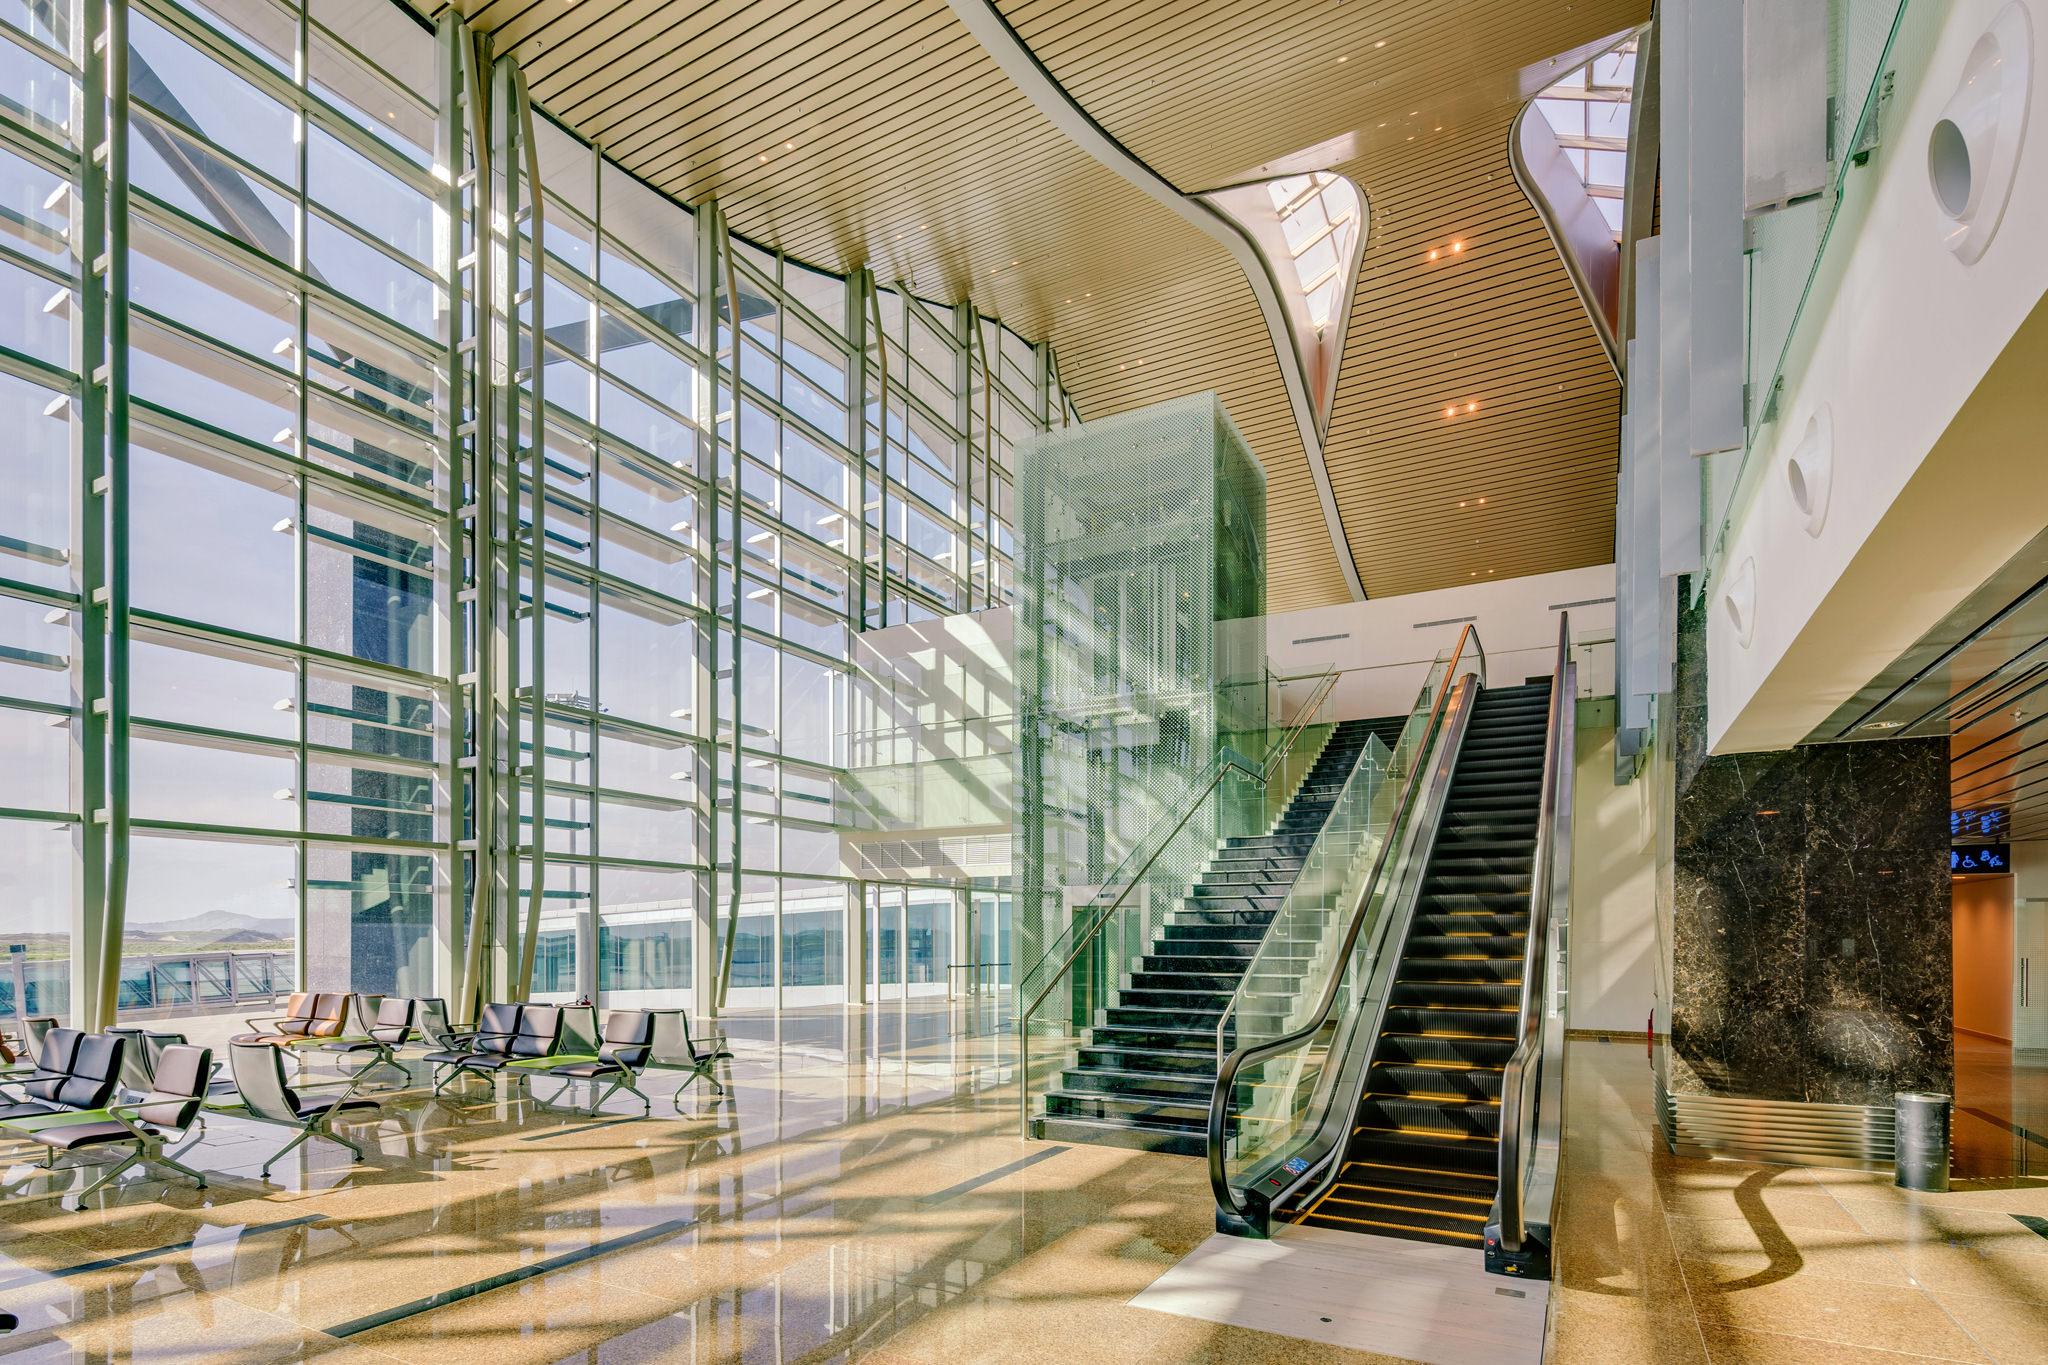 20180626 - Cam Ranh Airport - Architecture - 0176.jpg